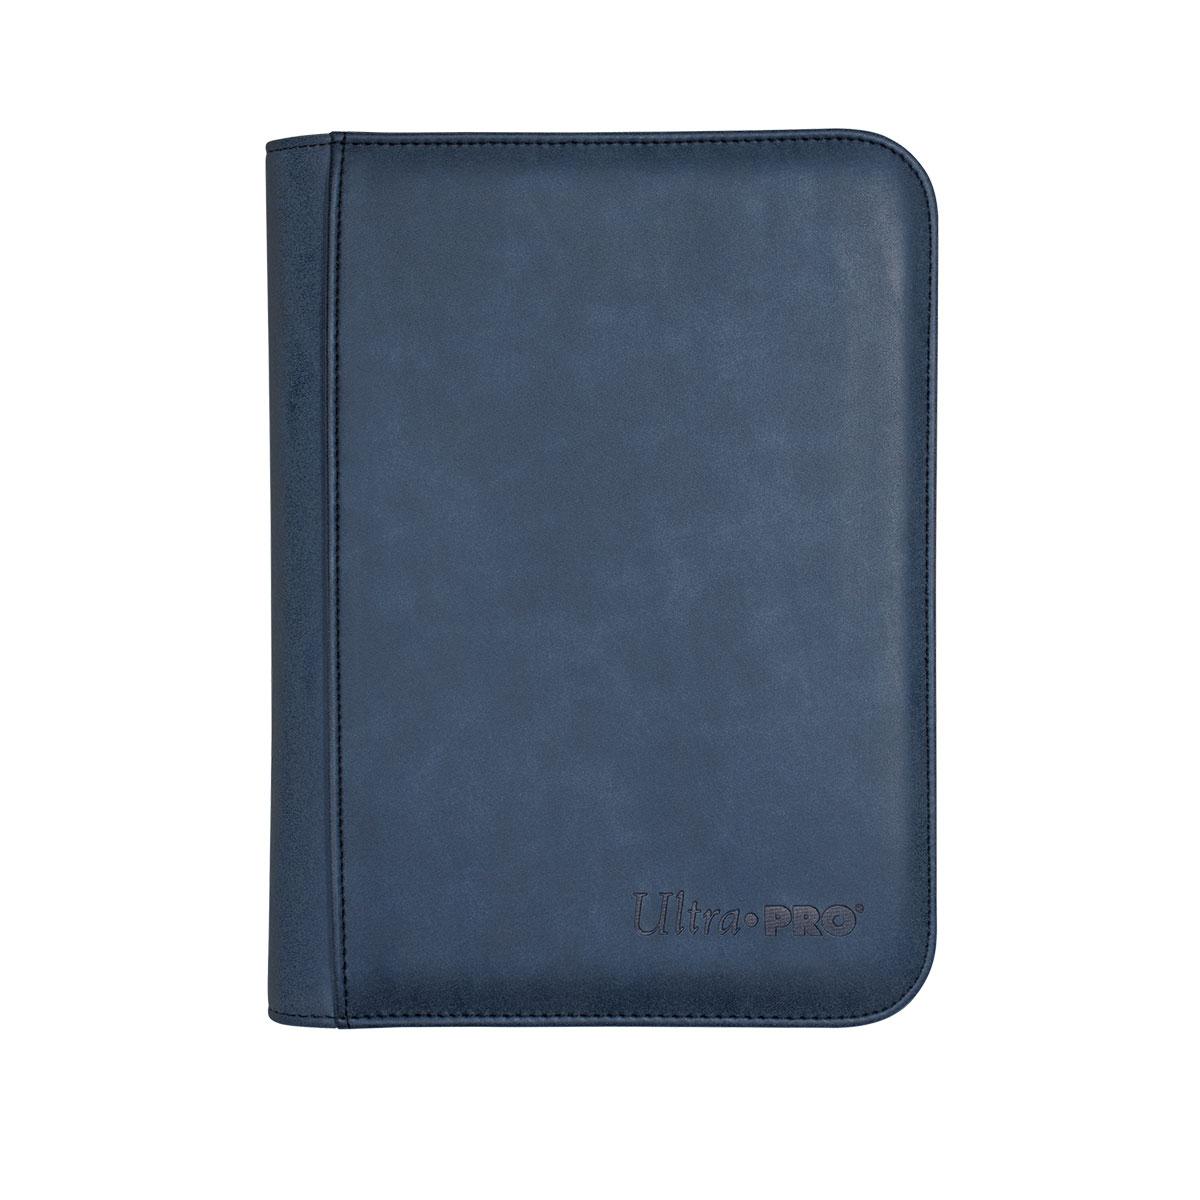 Pro-binder: Premium Zippered 4-pocket Suede Collection - Sapphire